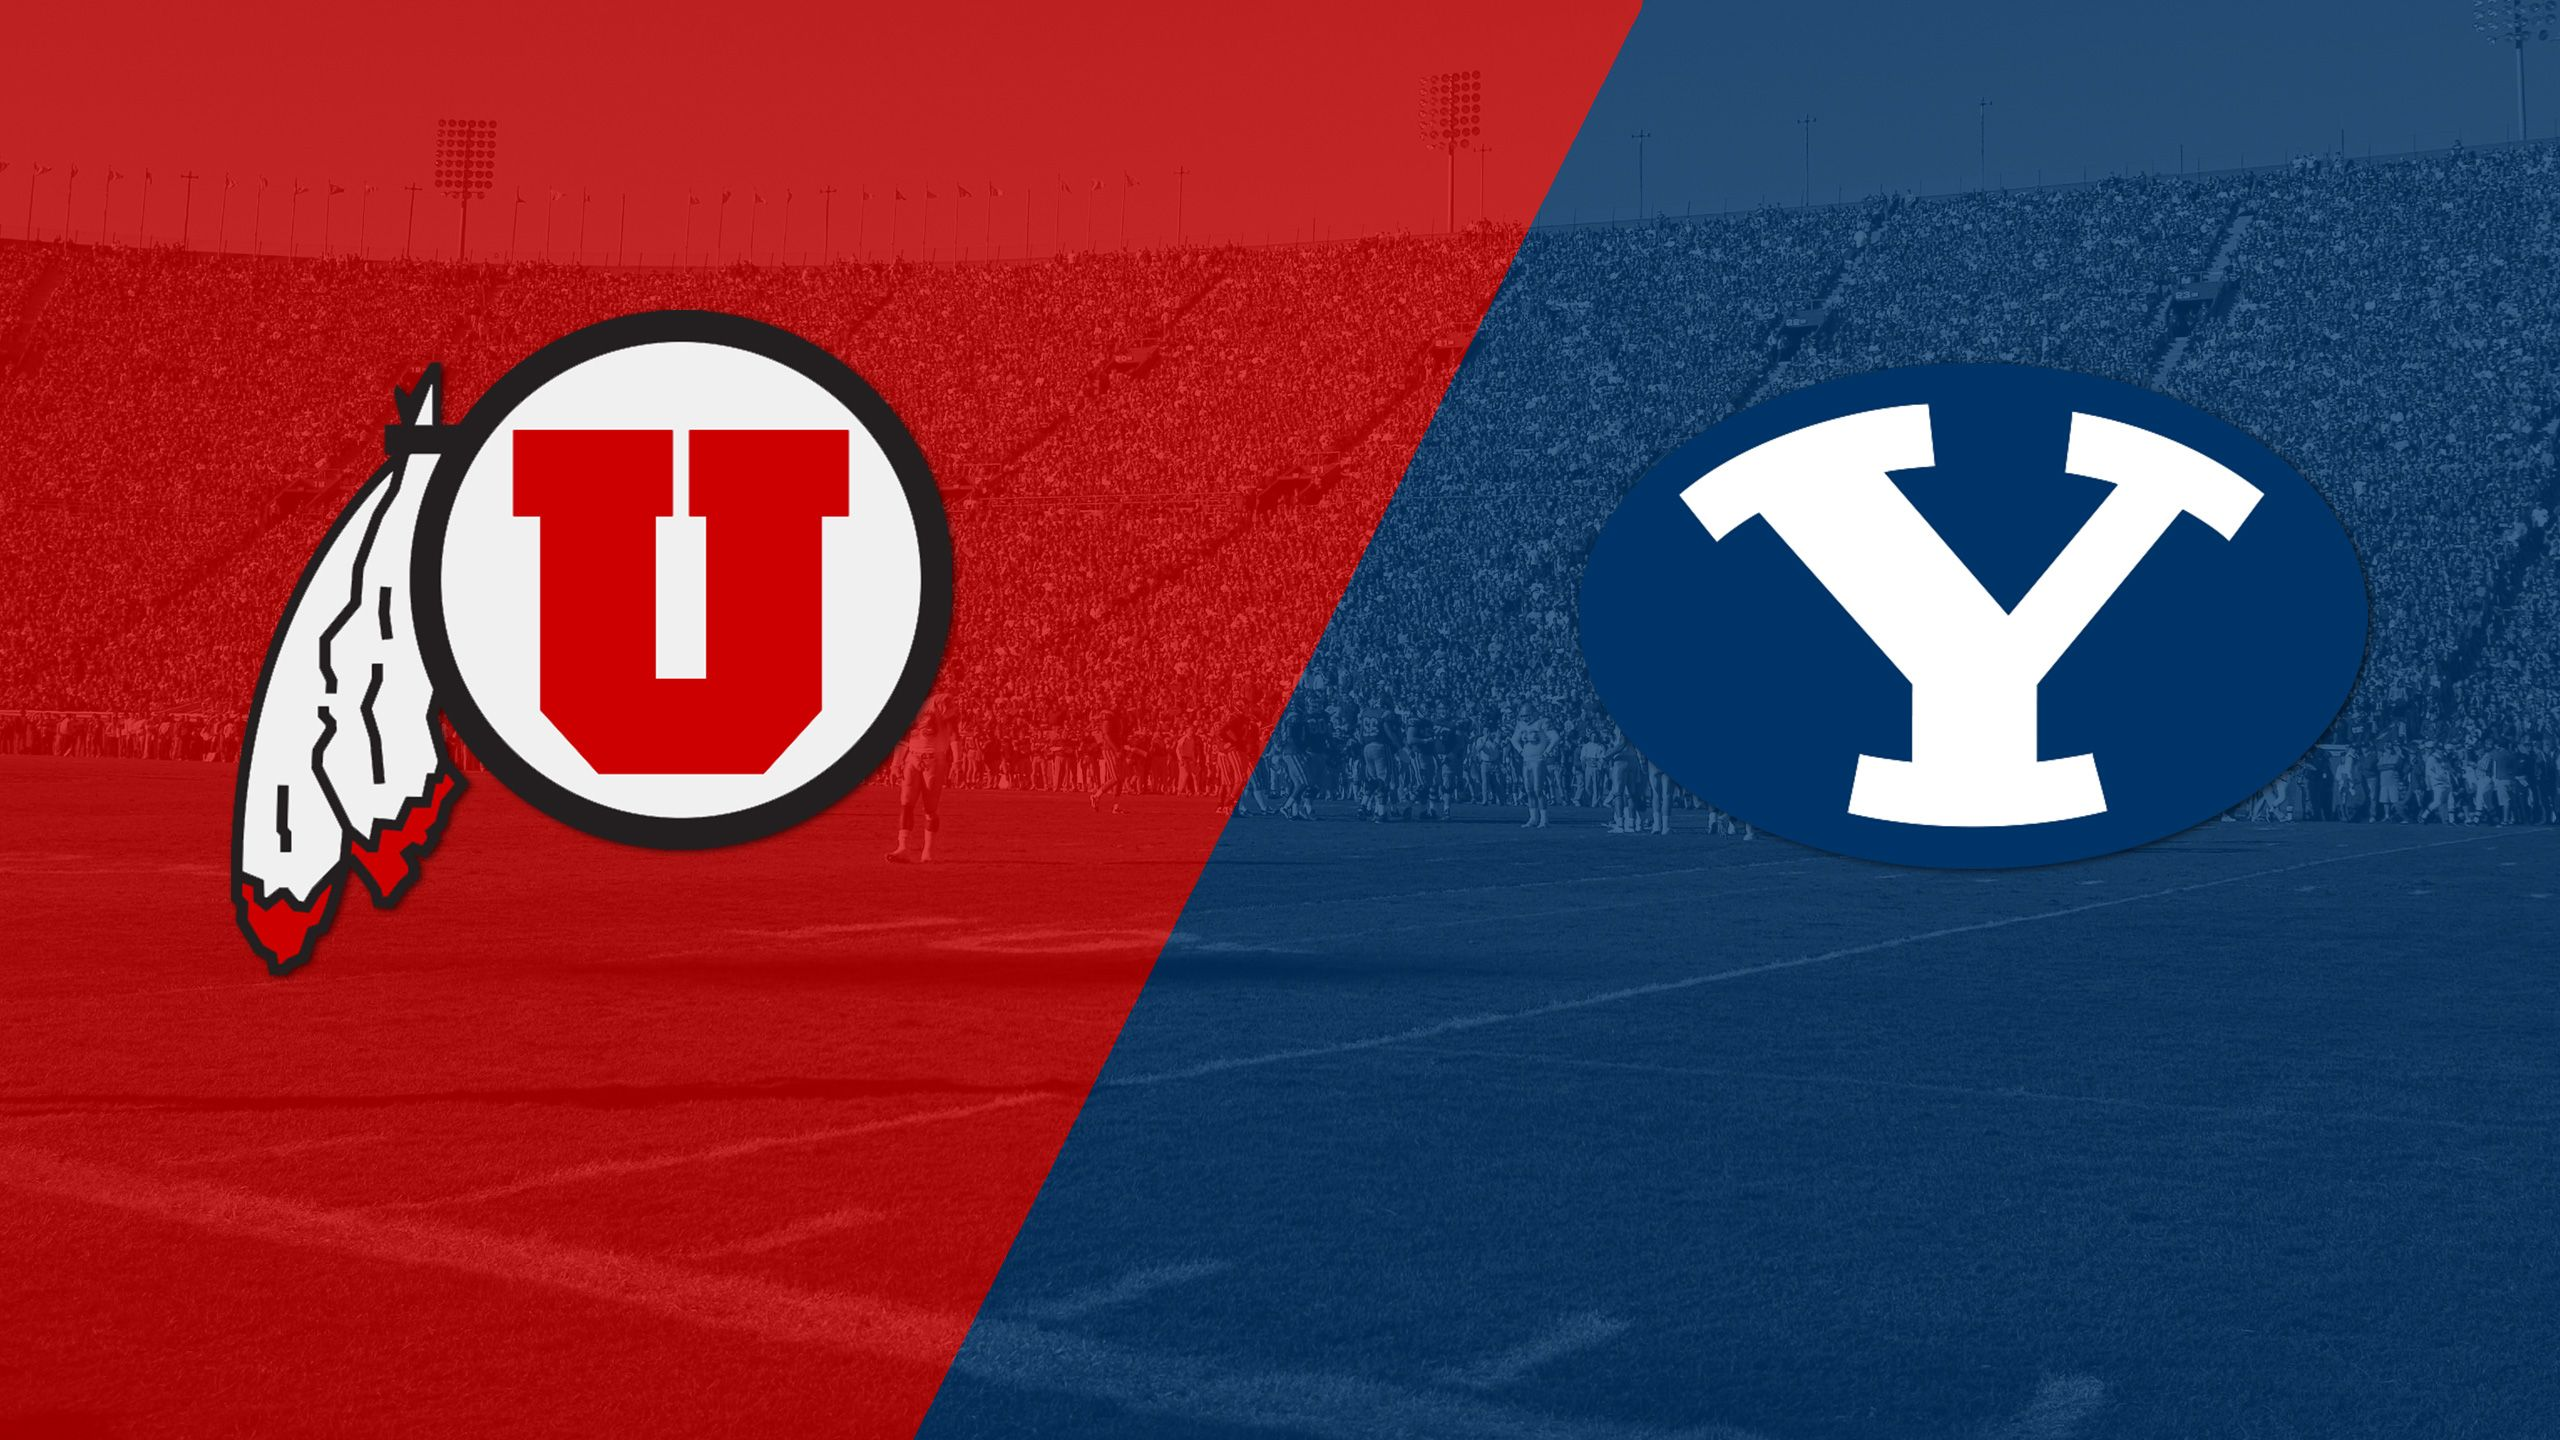 Utah vs. BYU (Football)